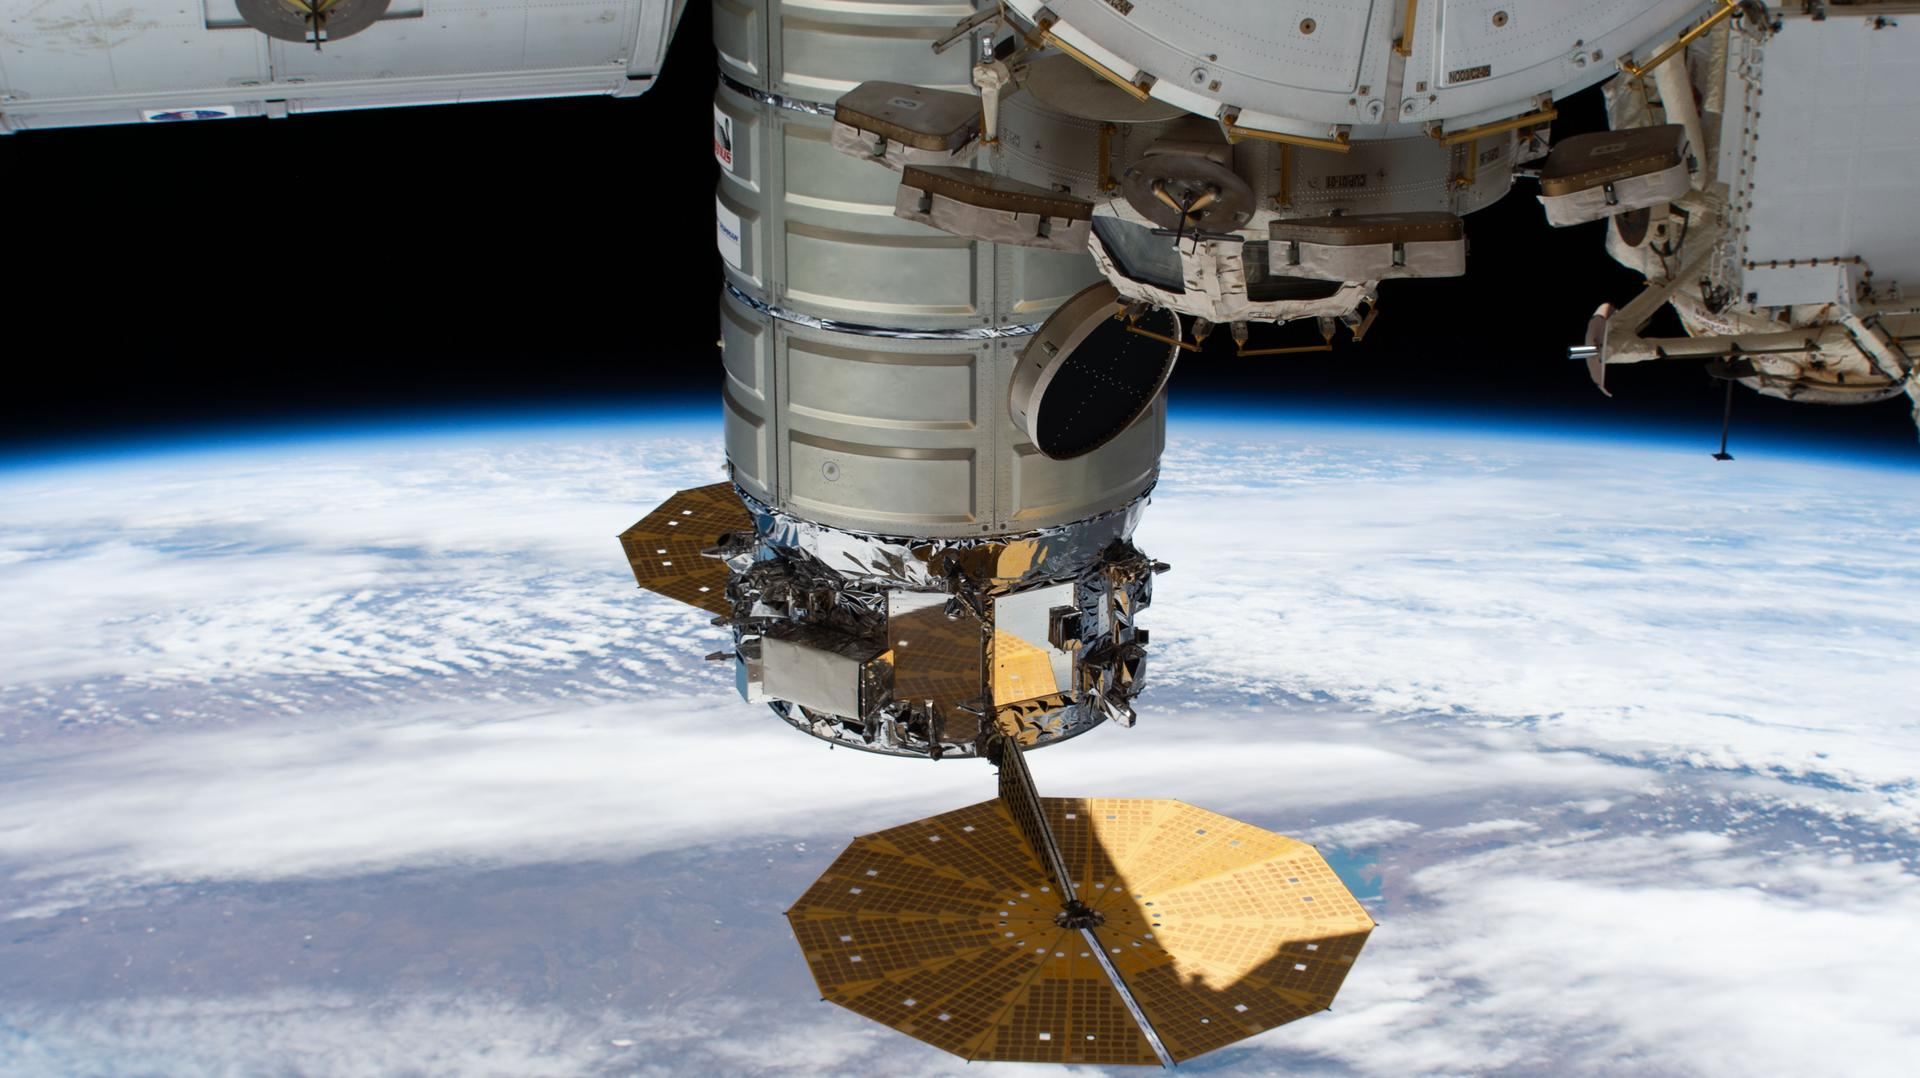 NASA Highlights Science on Next Northrop Grumman Space Station Mission - NASA